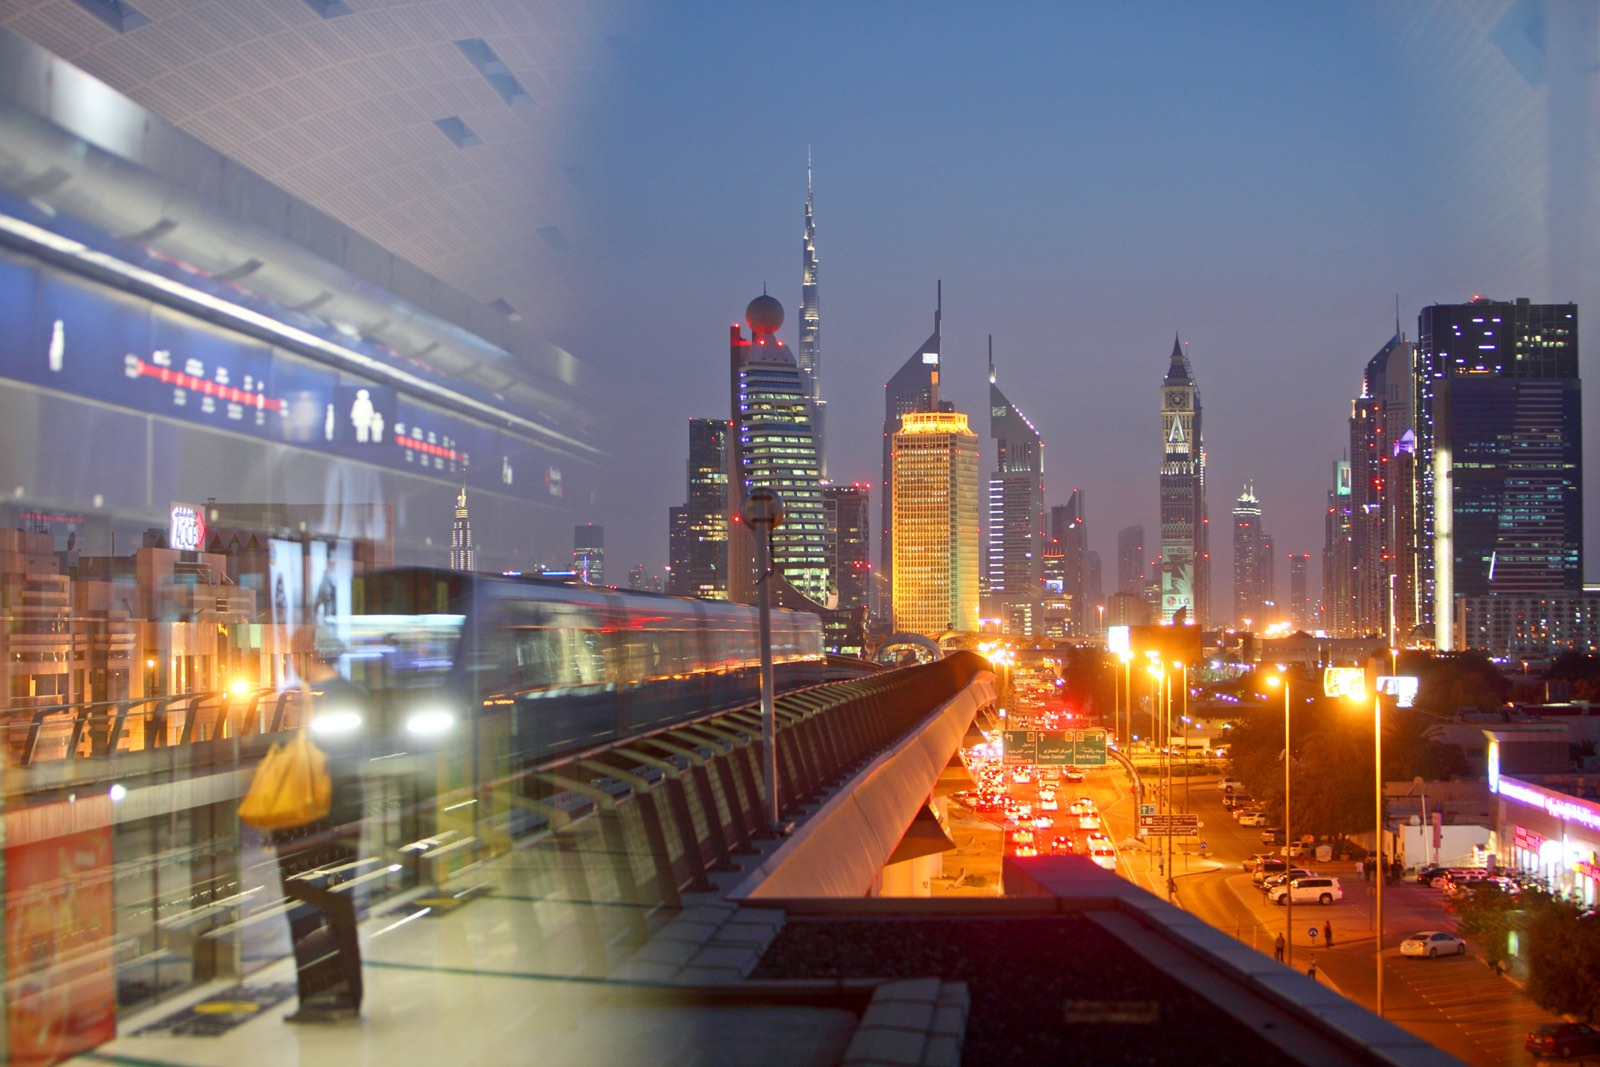 Straatfotografie in Dubai 's nachts